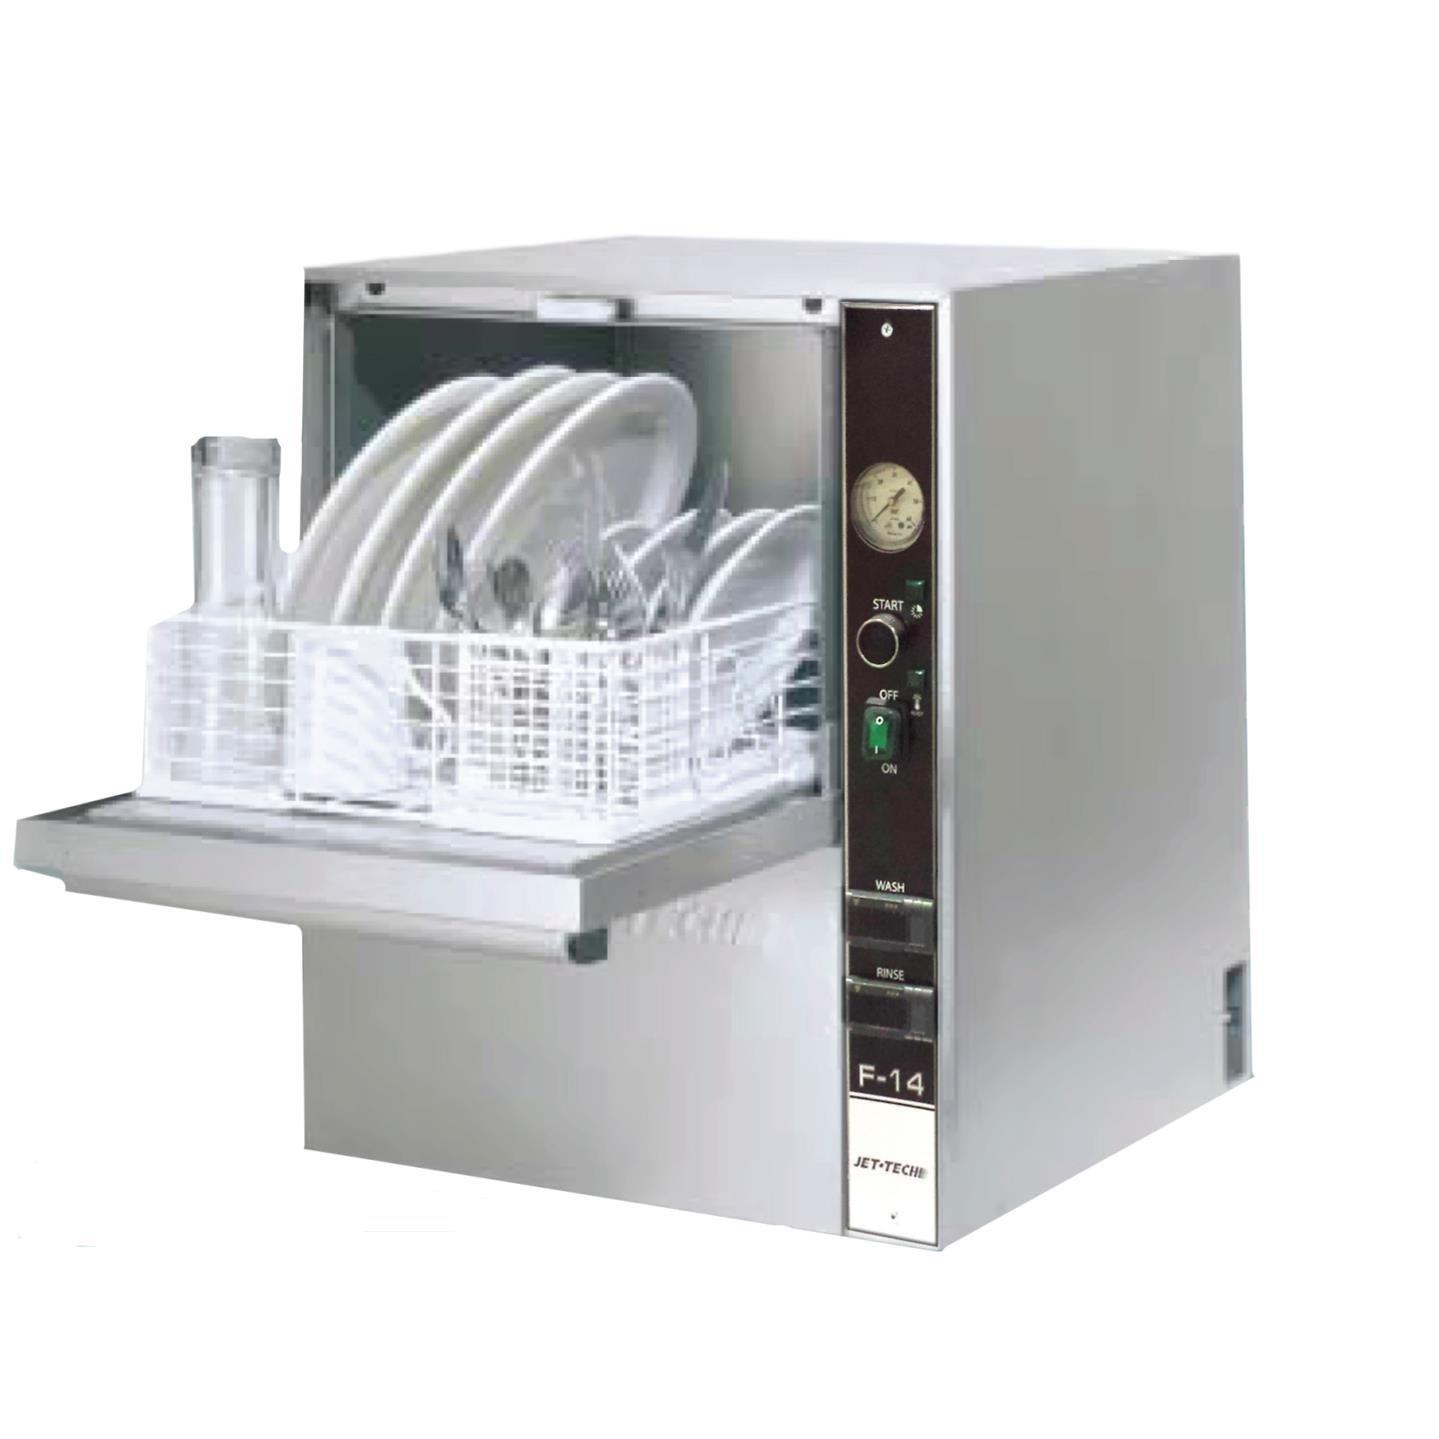 portable countertop dishwashers